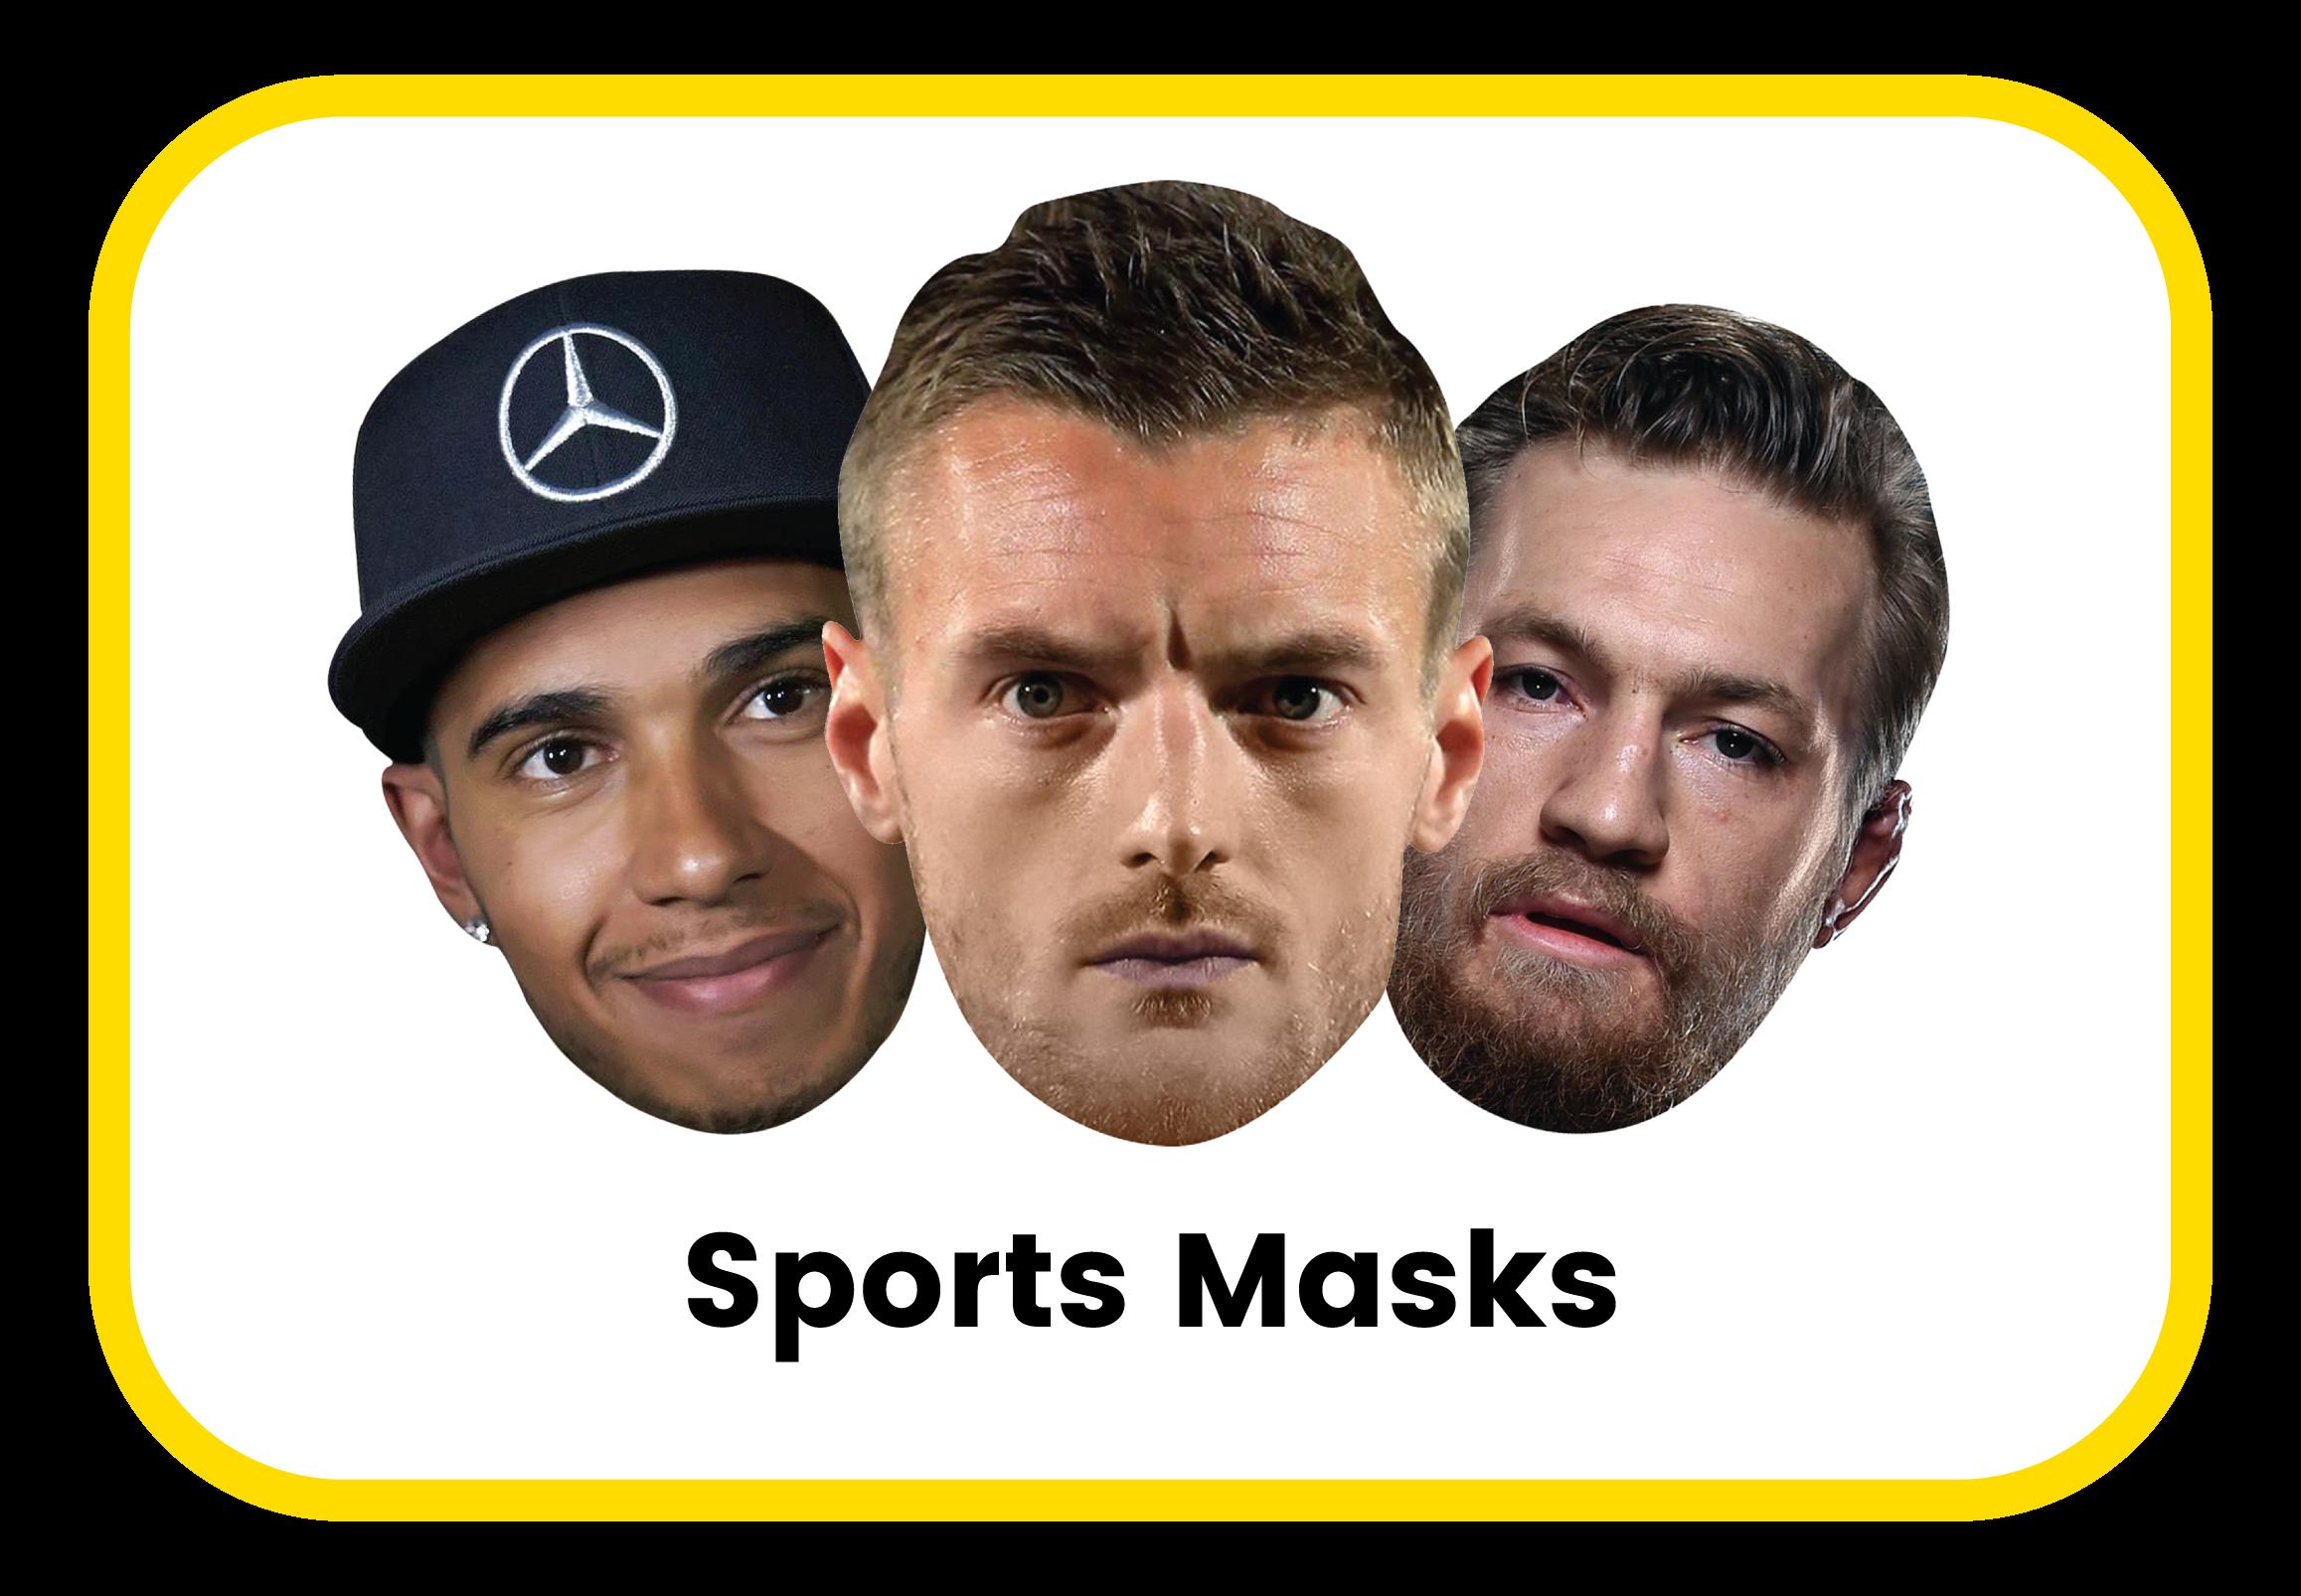 Sports cardboard masks